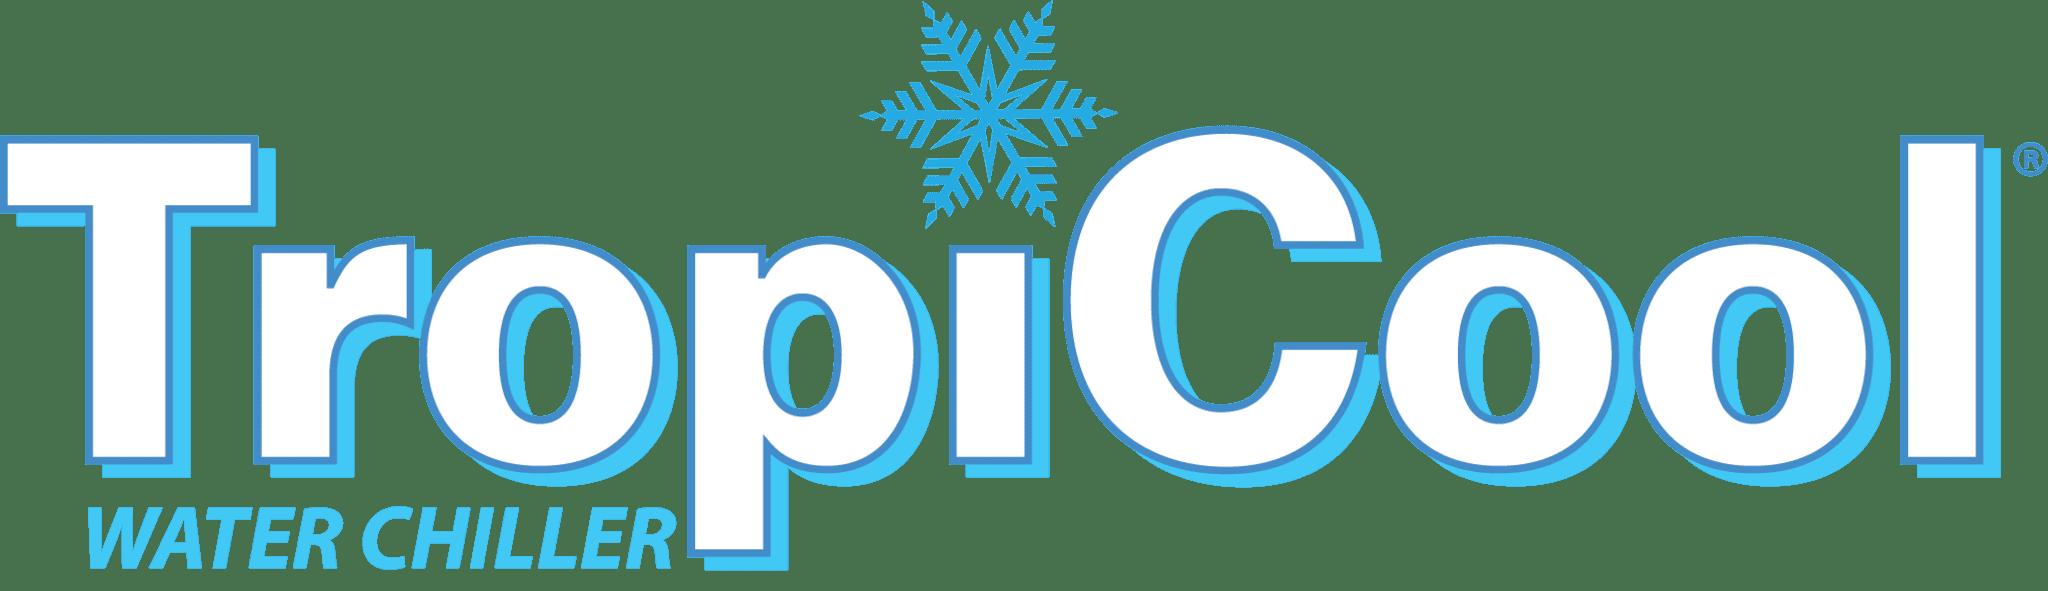 https://globalpools.com/wp-content/uploads/2021/02/heater-11-1.png